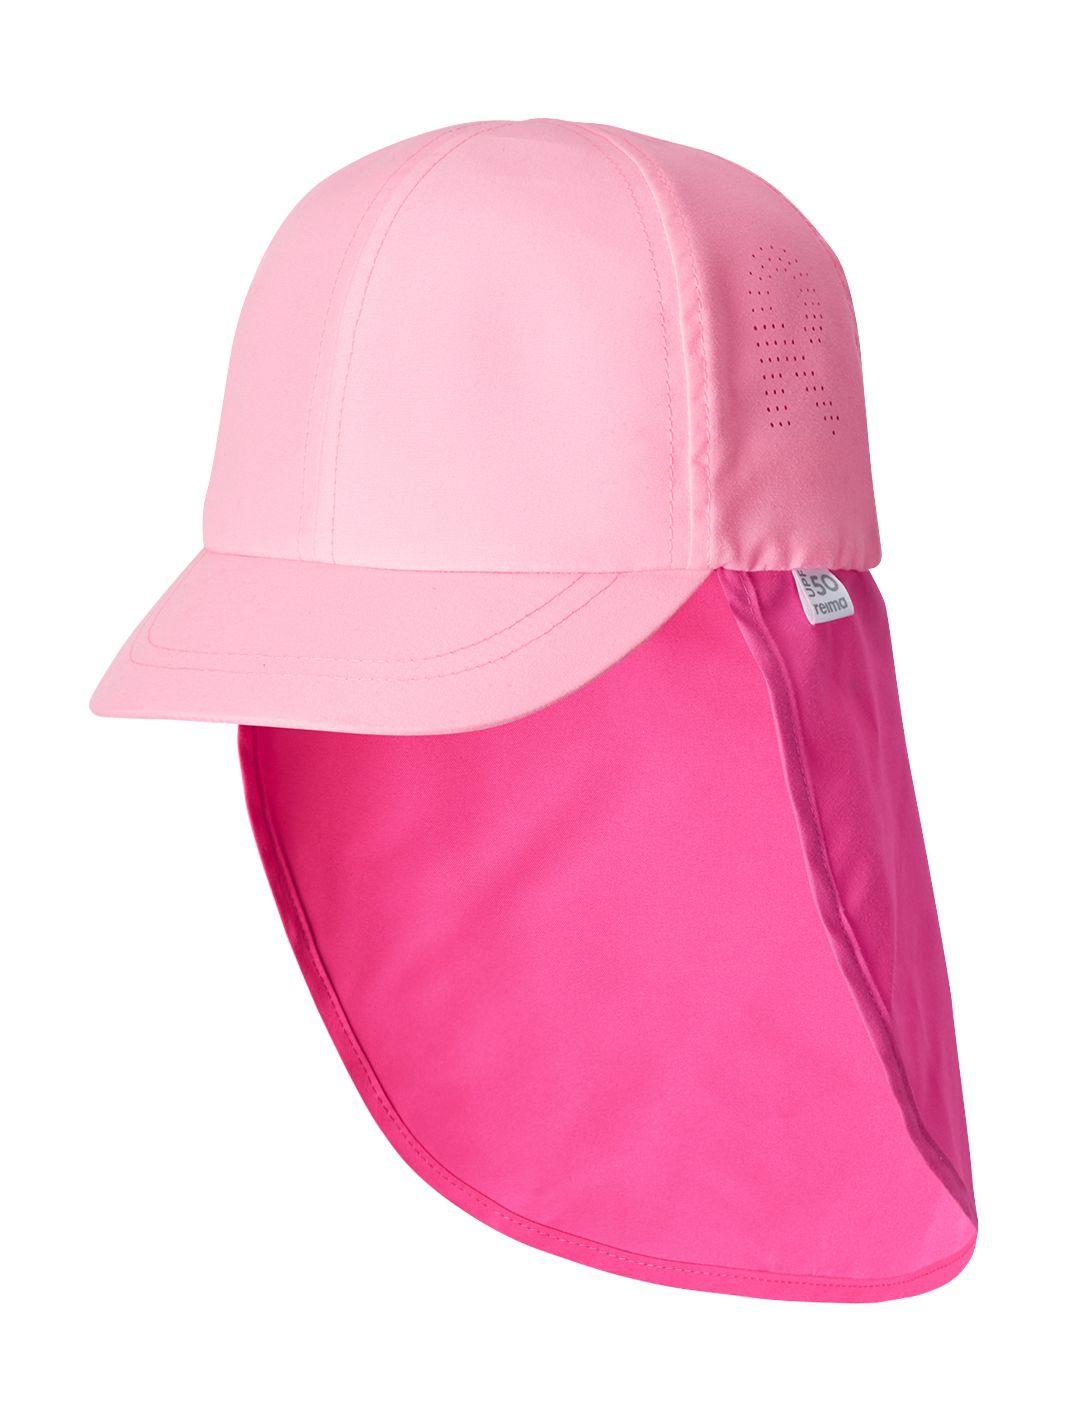 REIMA Vesikirppu Neon Pink 54